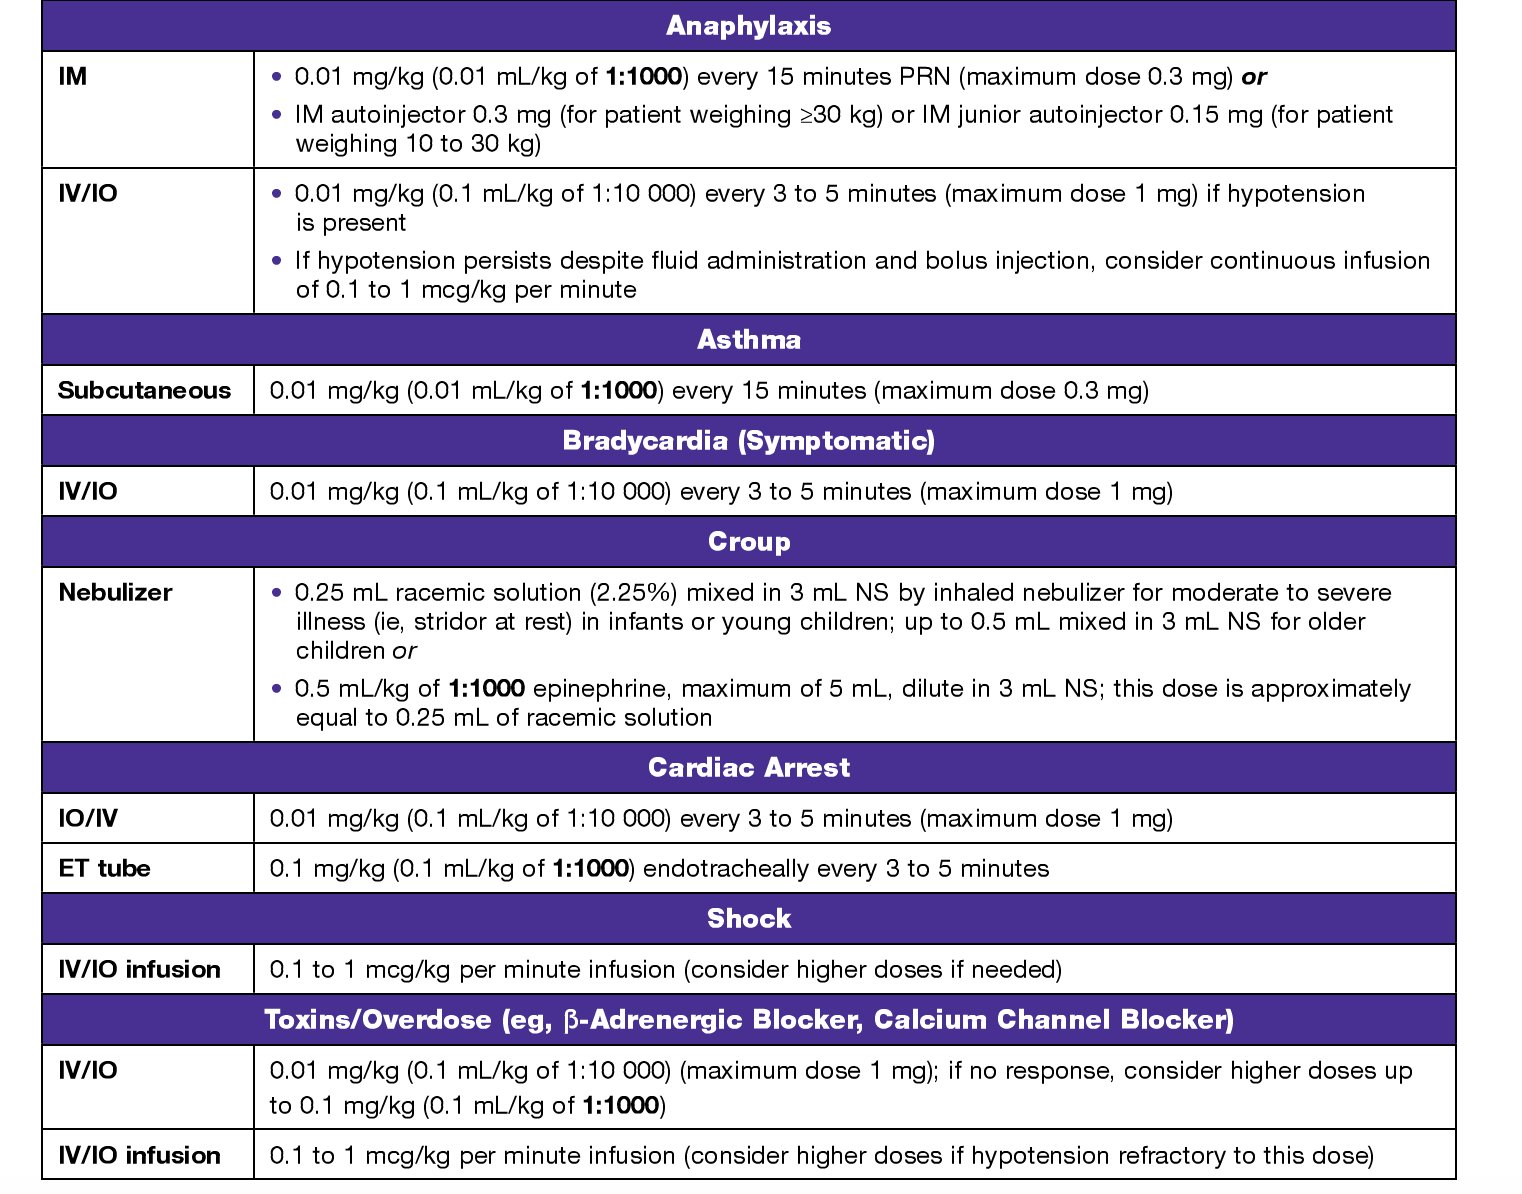 epinephrine AHA guidelines PALS Pharmacology